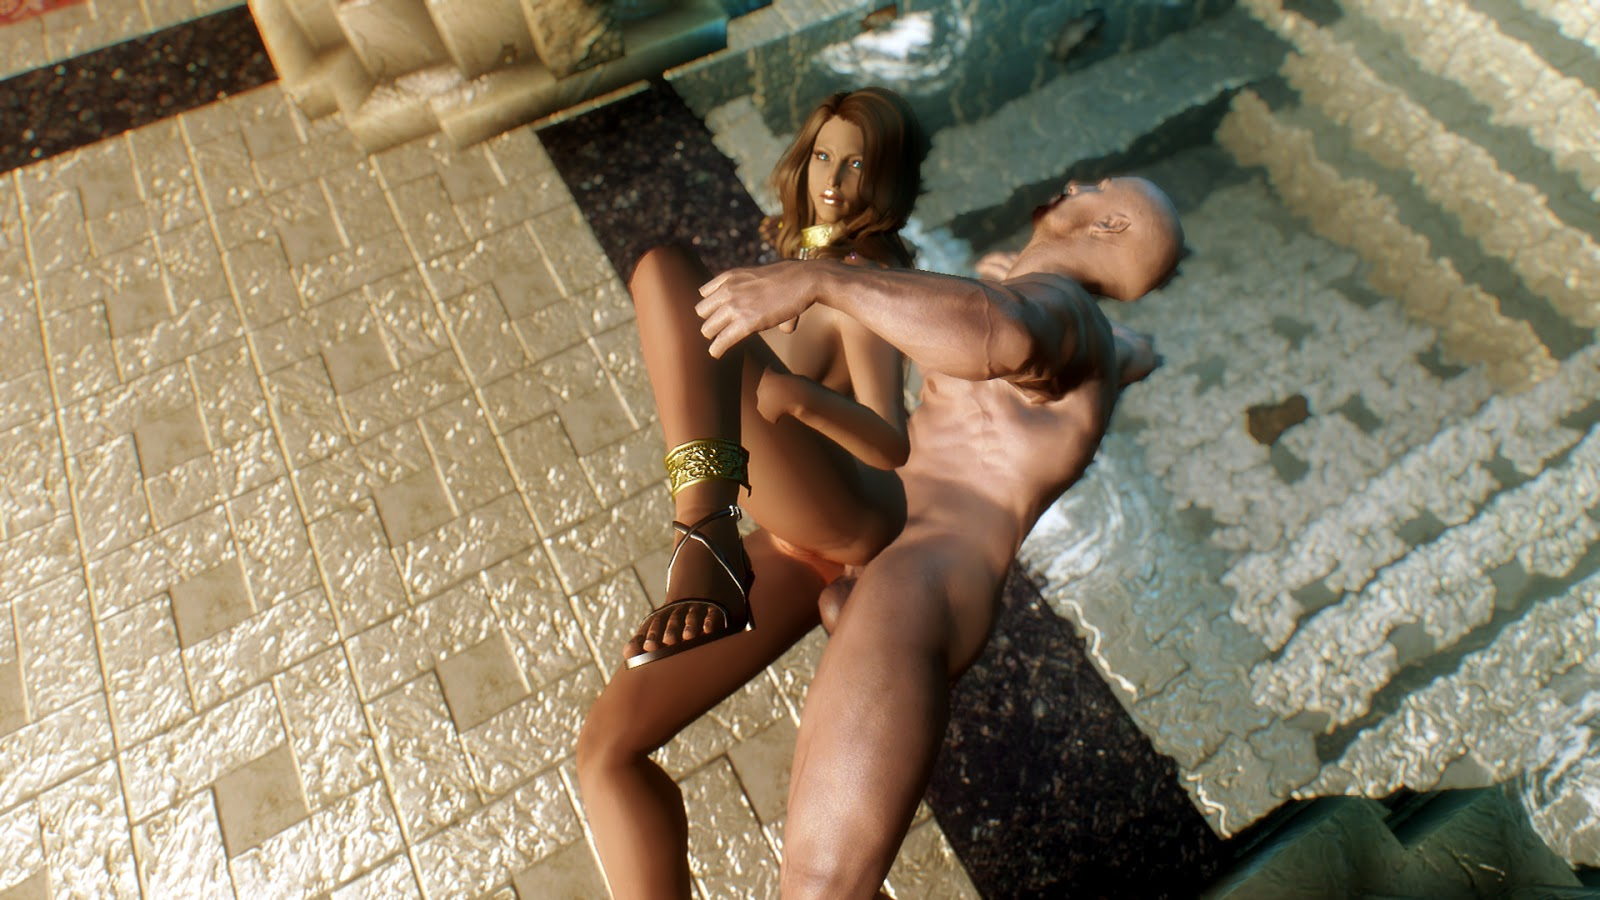 Nude mod butt gif pornos scenes